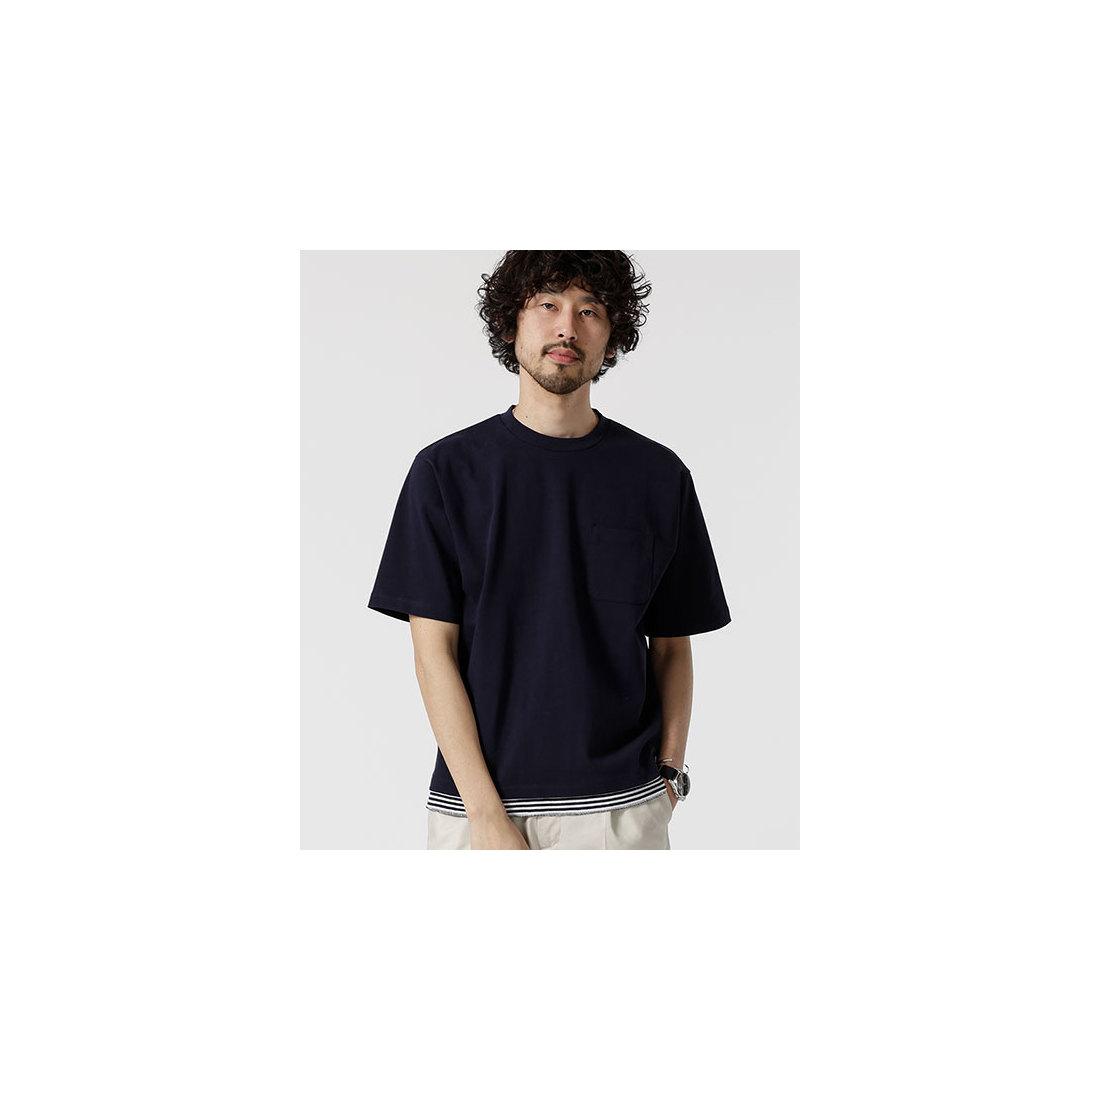 【19SS】 (nano universe) フェイクレイヤードBIG Tシャツ/ (メンズ) ナノ・ユニバース